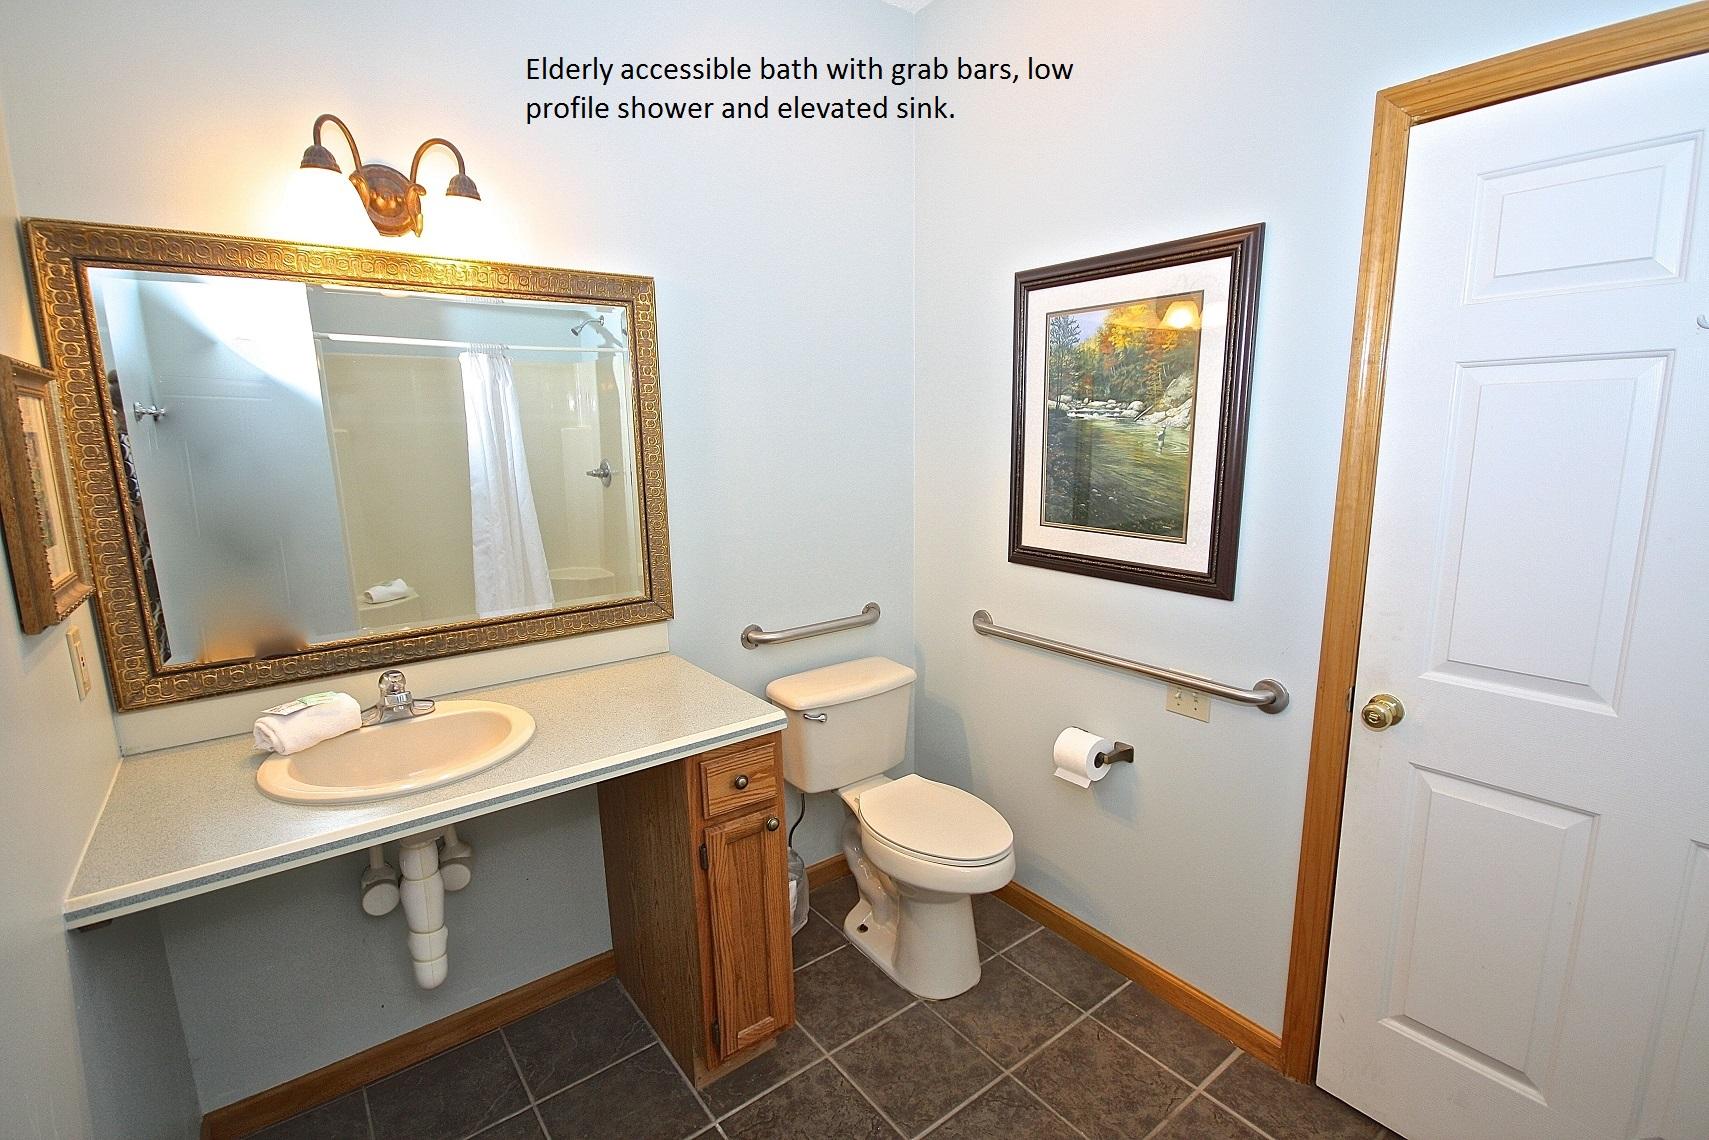 Handicap accessible bath-Original